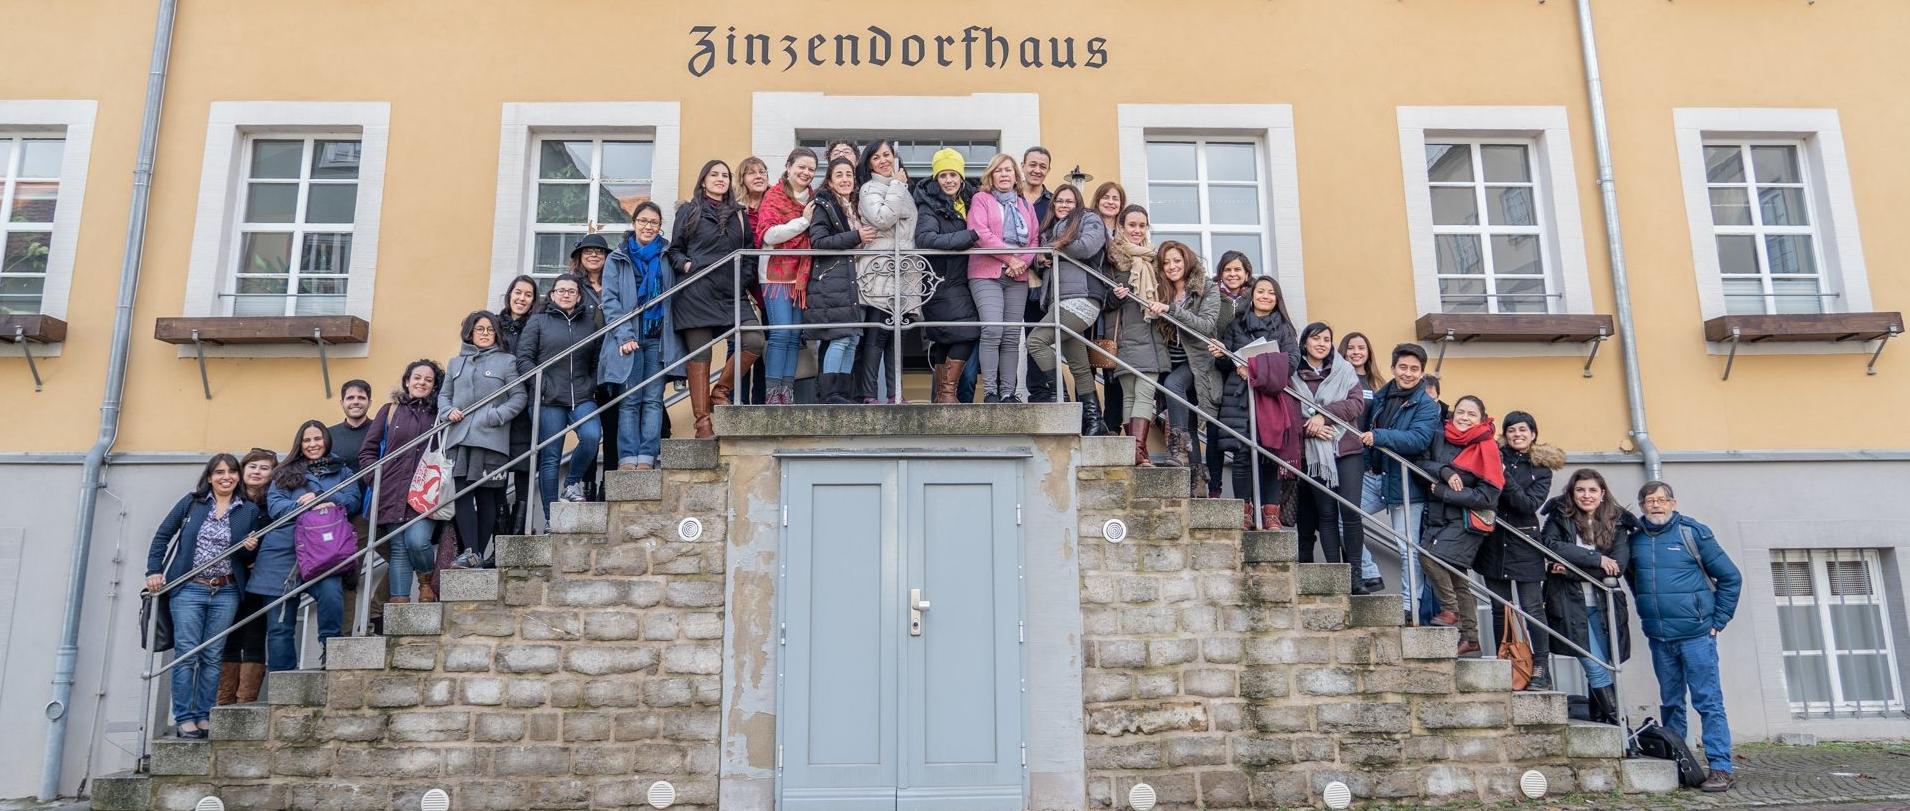 Seminario en Erfurt